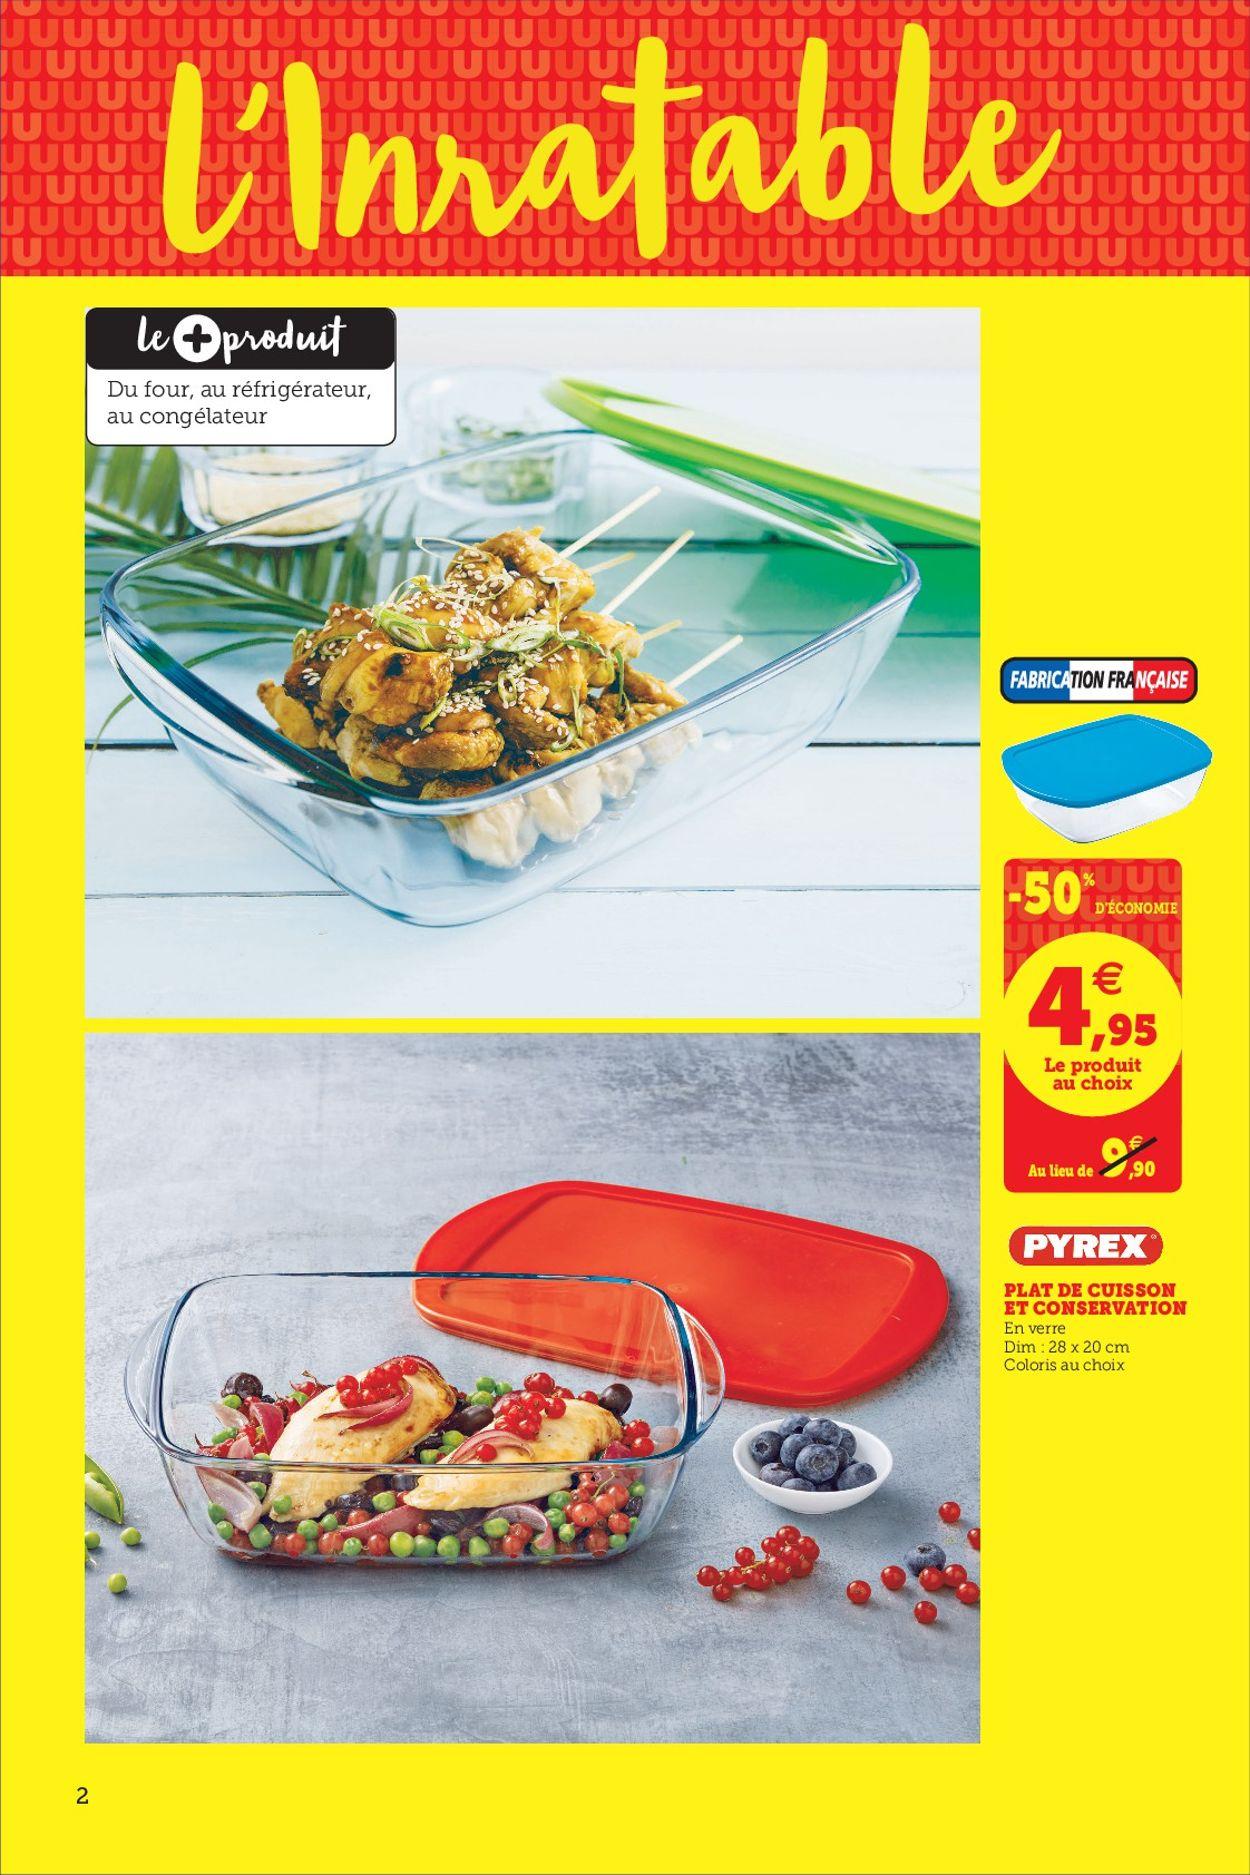 Magasins U Catalogue - 07.07-18.07.2020 (Page 2)